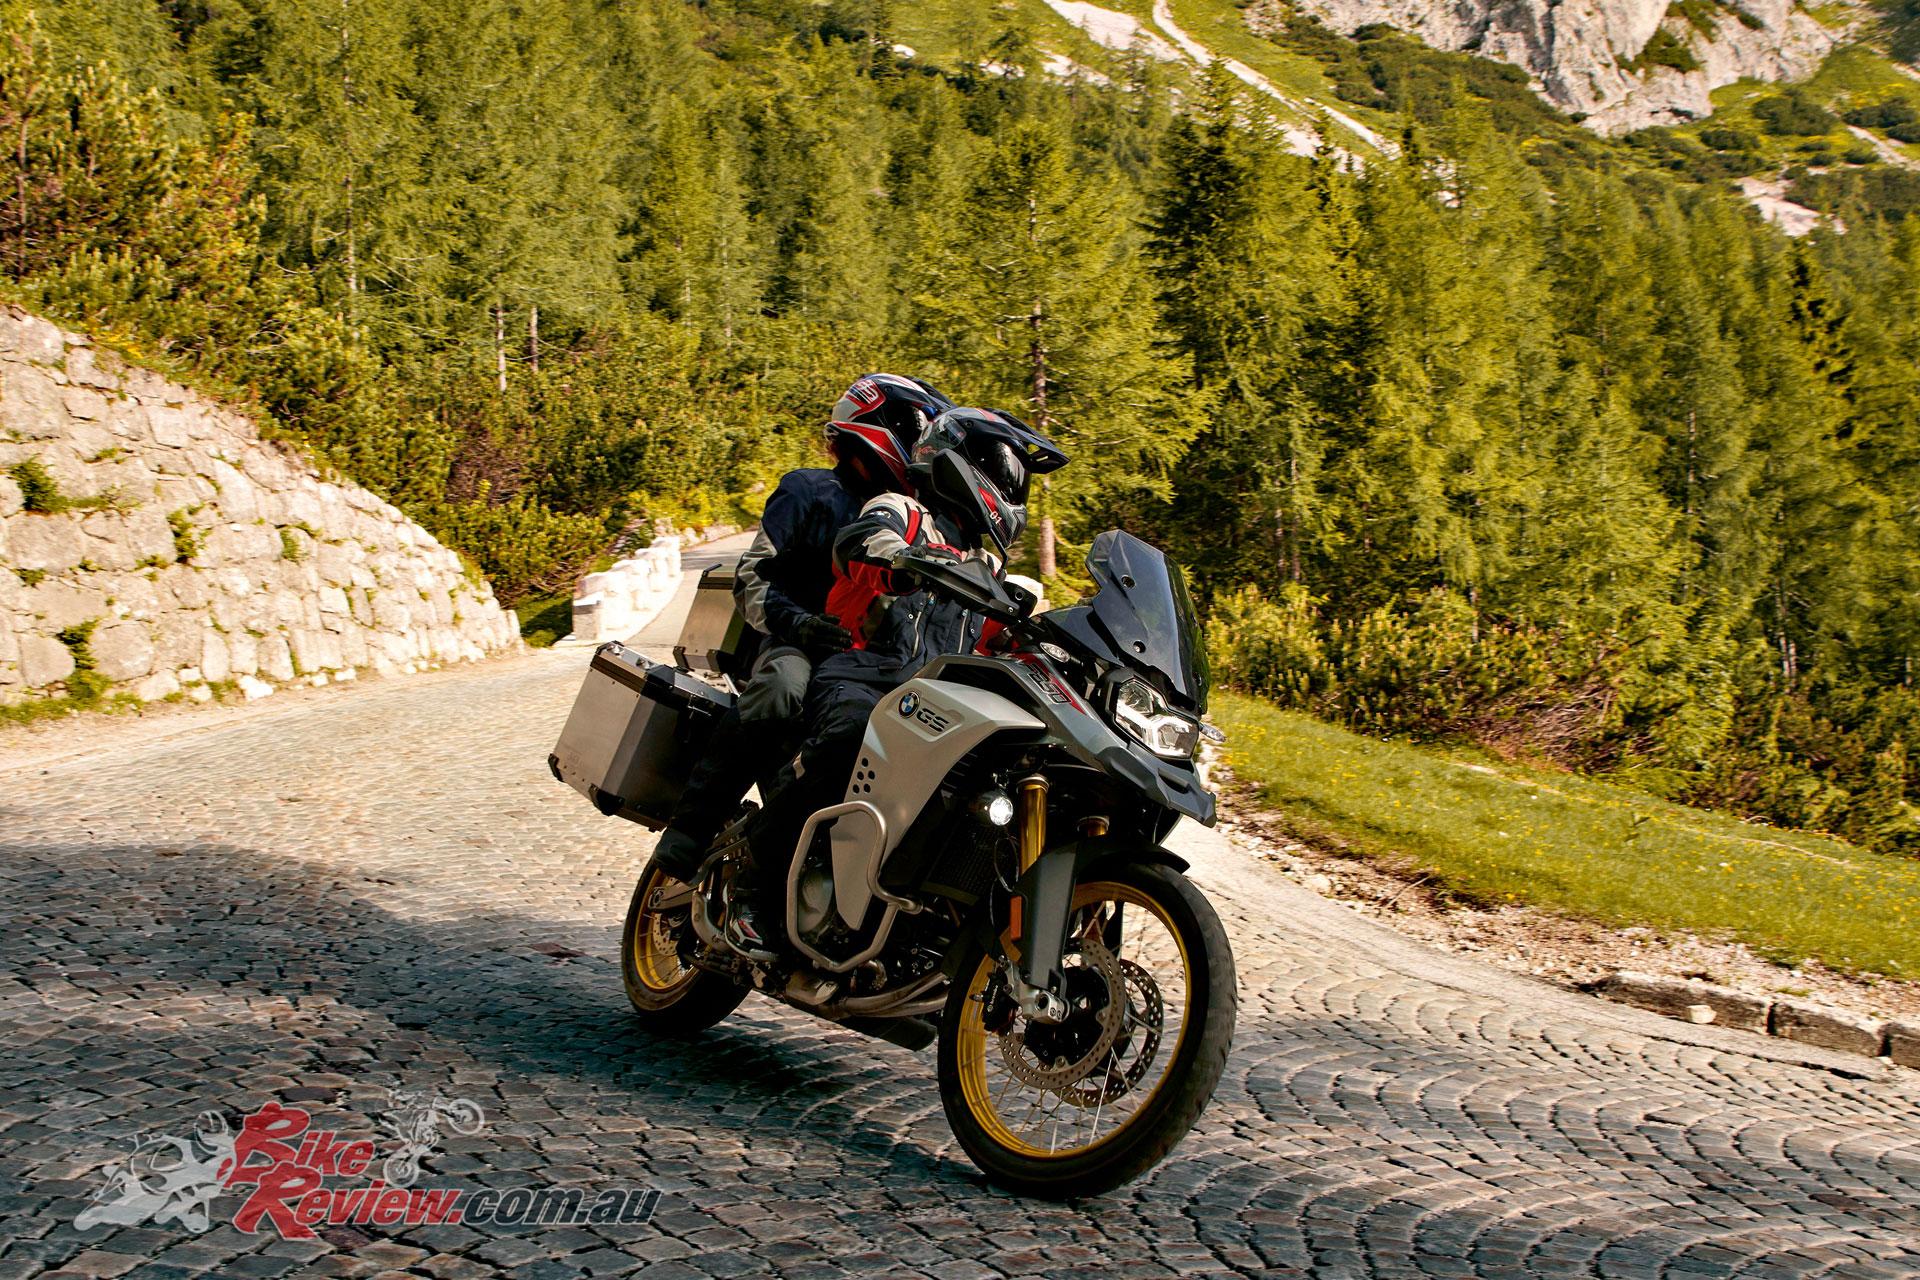 New Model 2019 Bmw F 850 Gs Adventure Bike Review